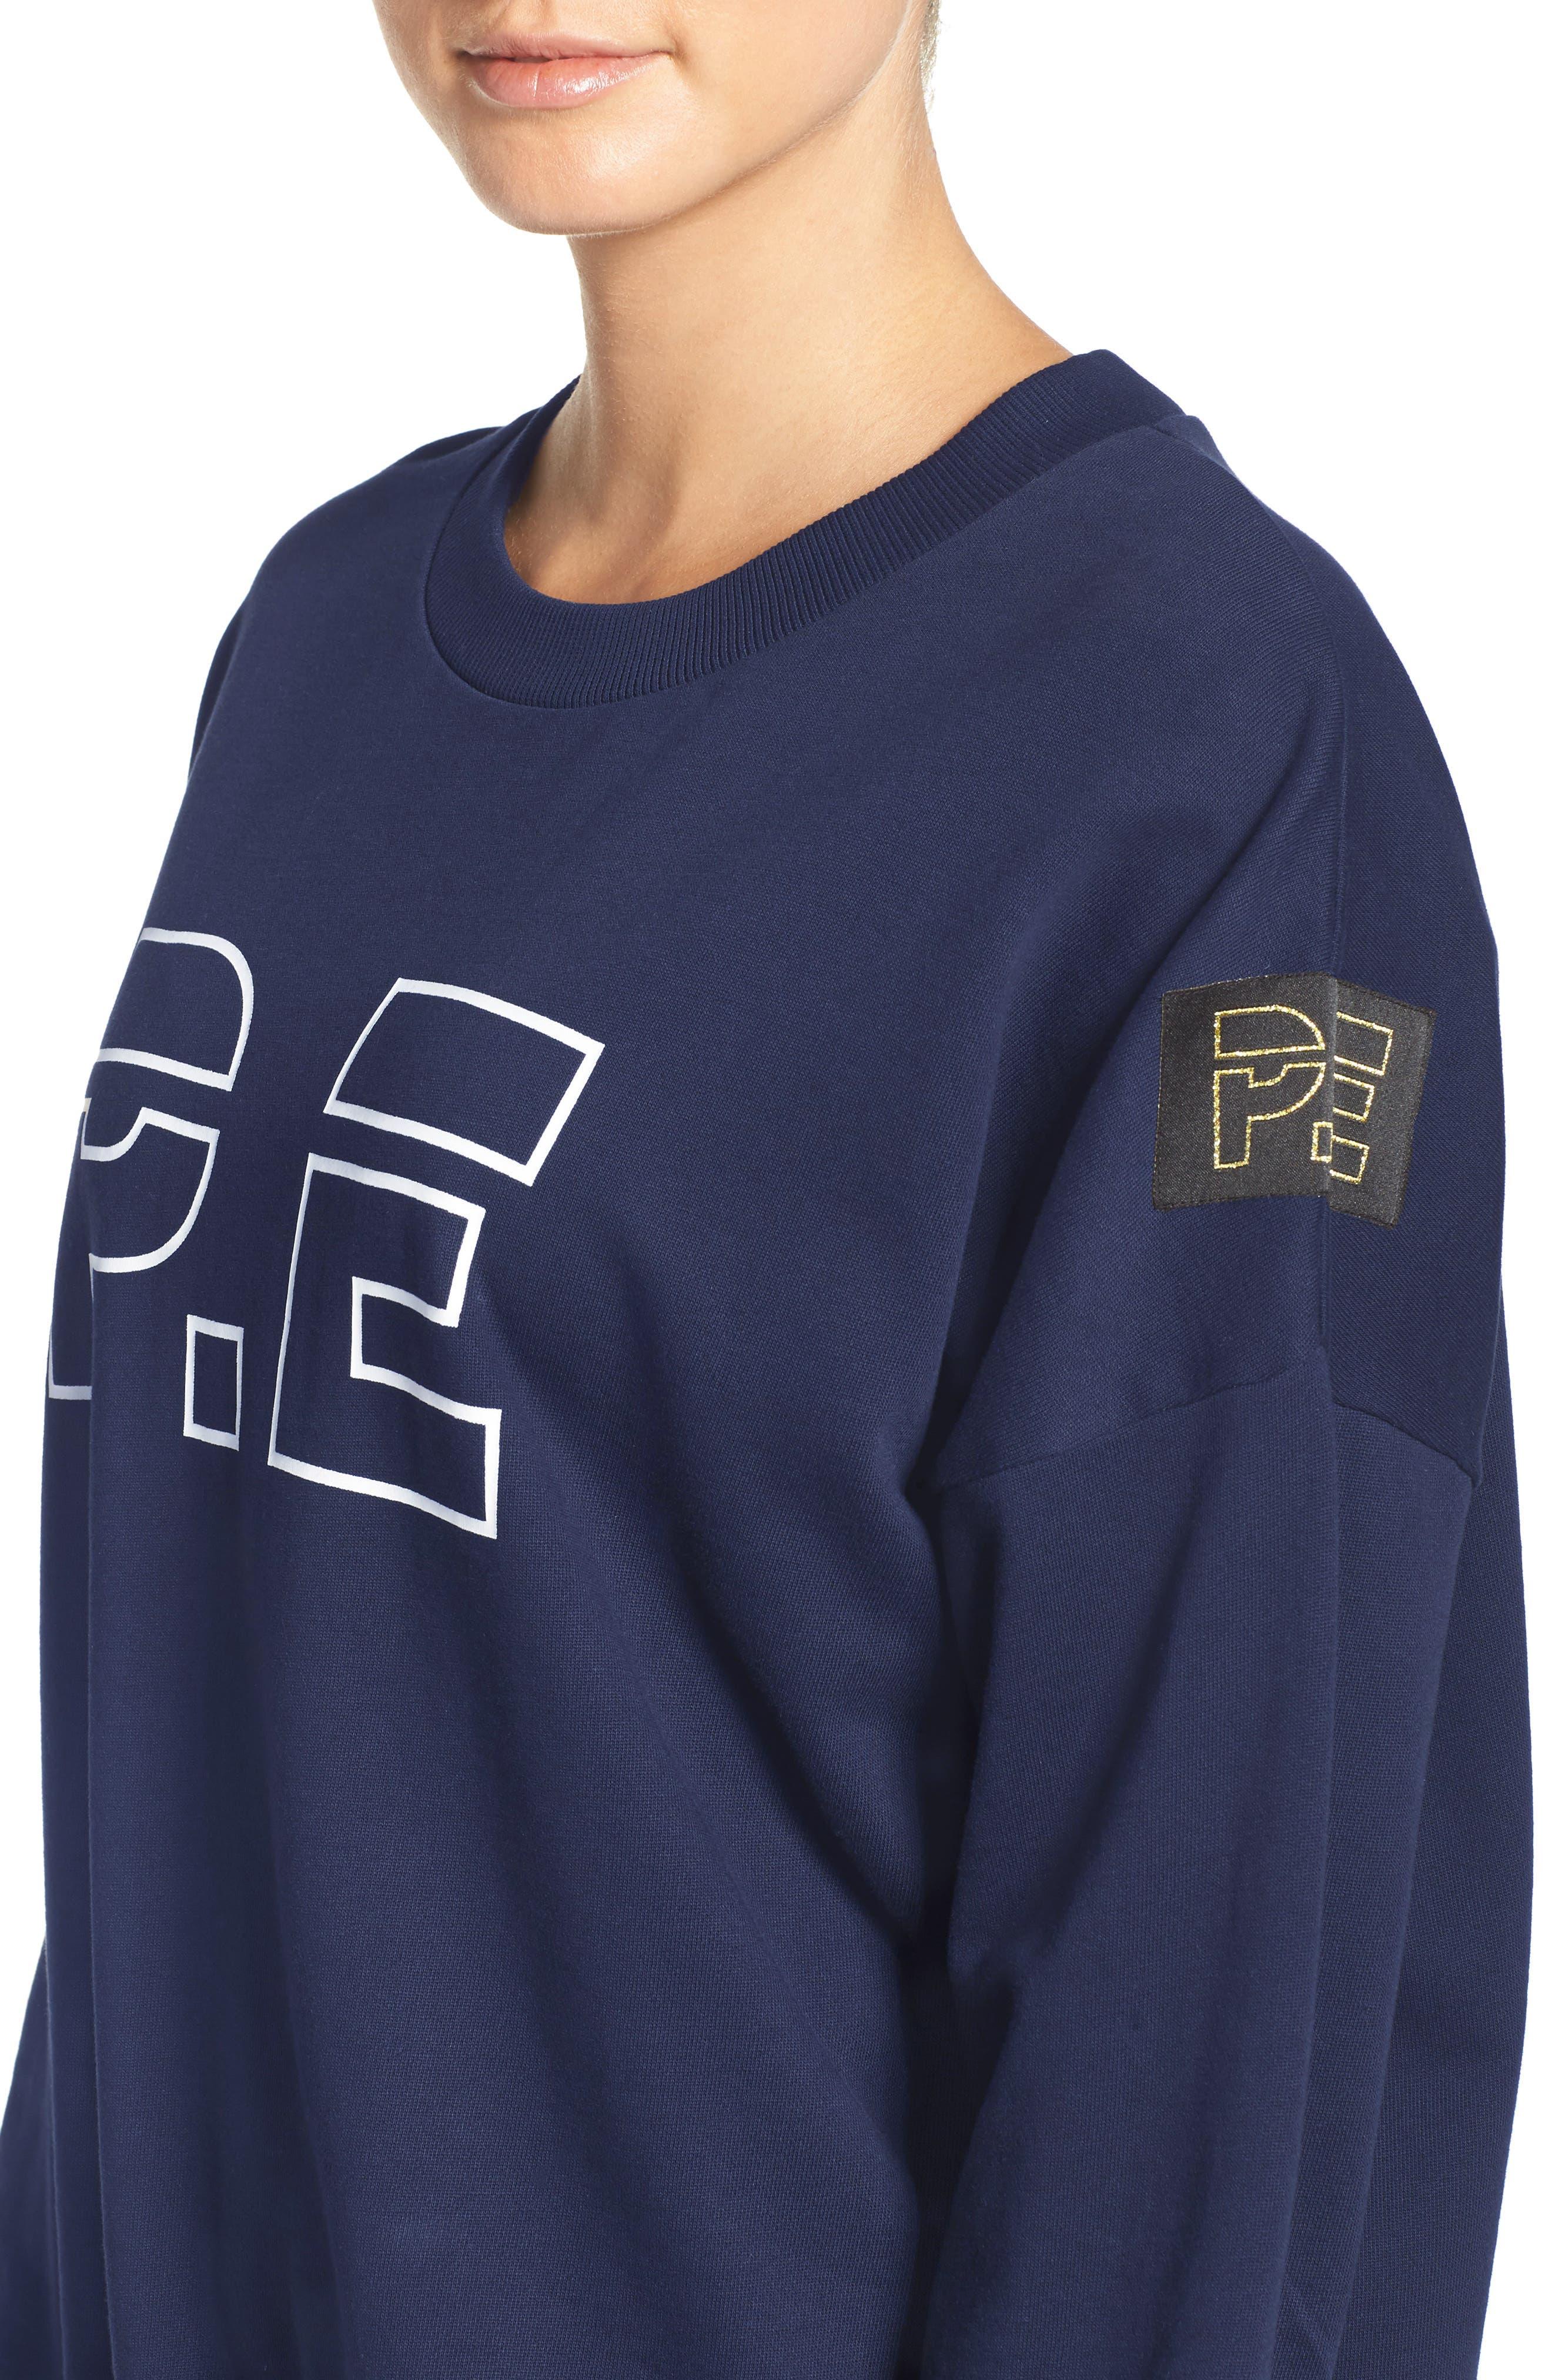 P.E. Nation The Heads Up Sweatshirt,                             Alternate thumbnail 4, color,                             410